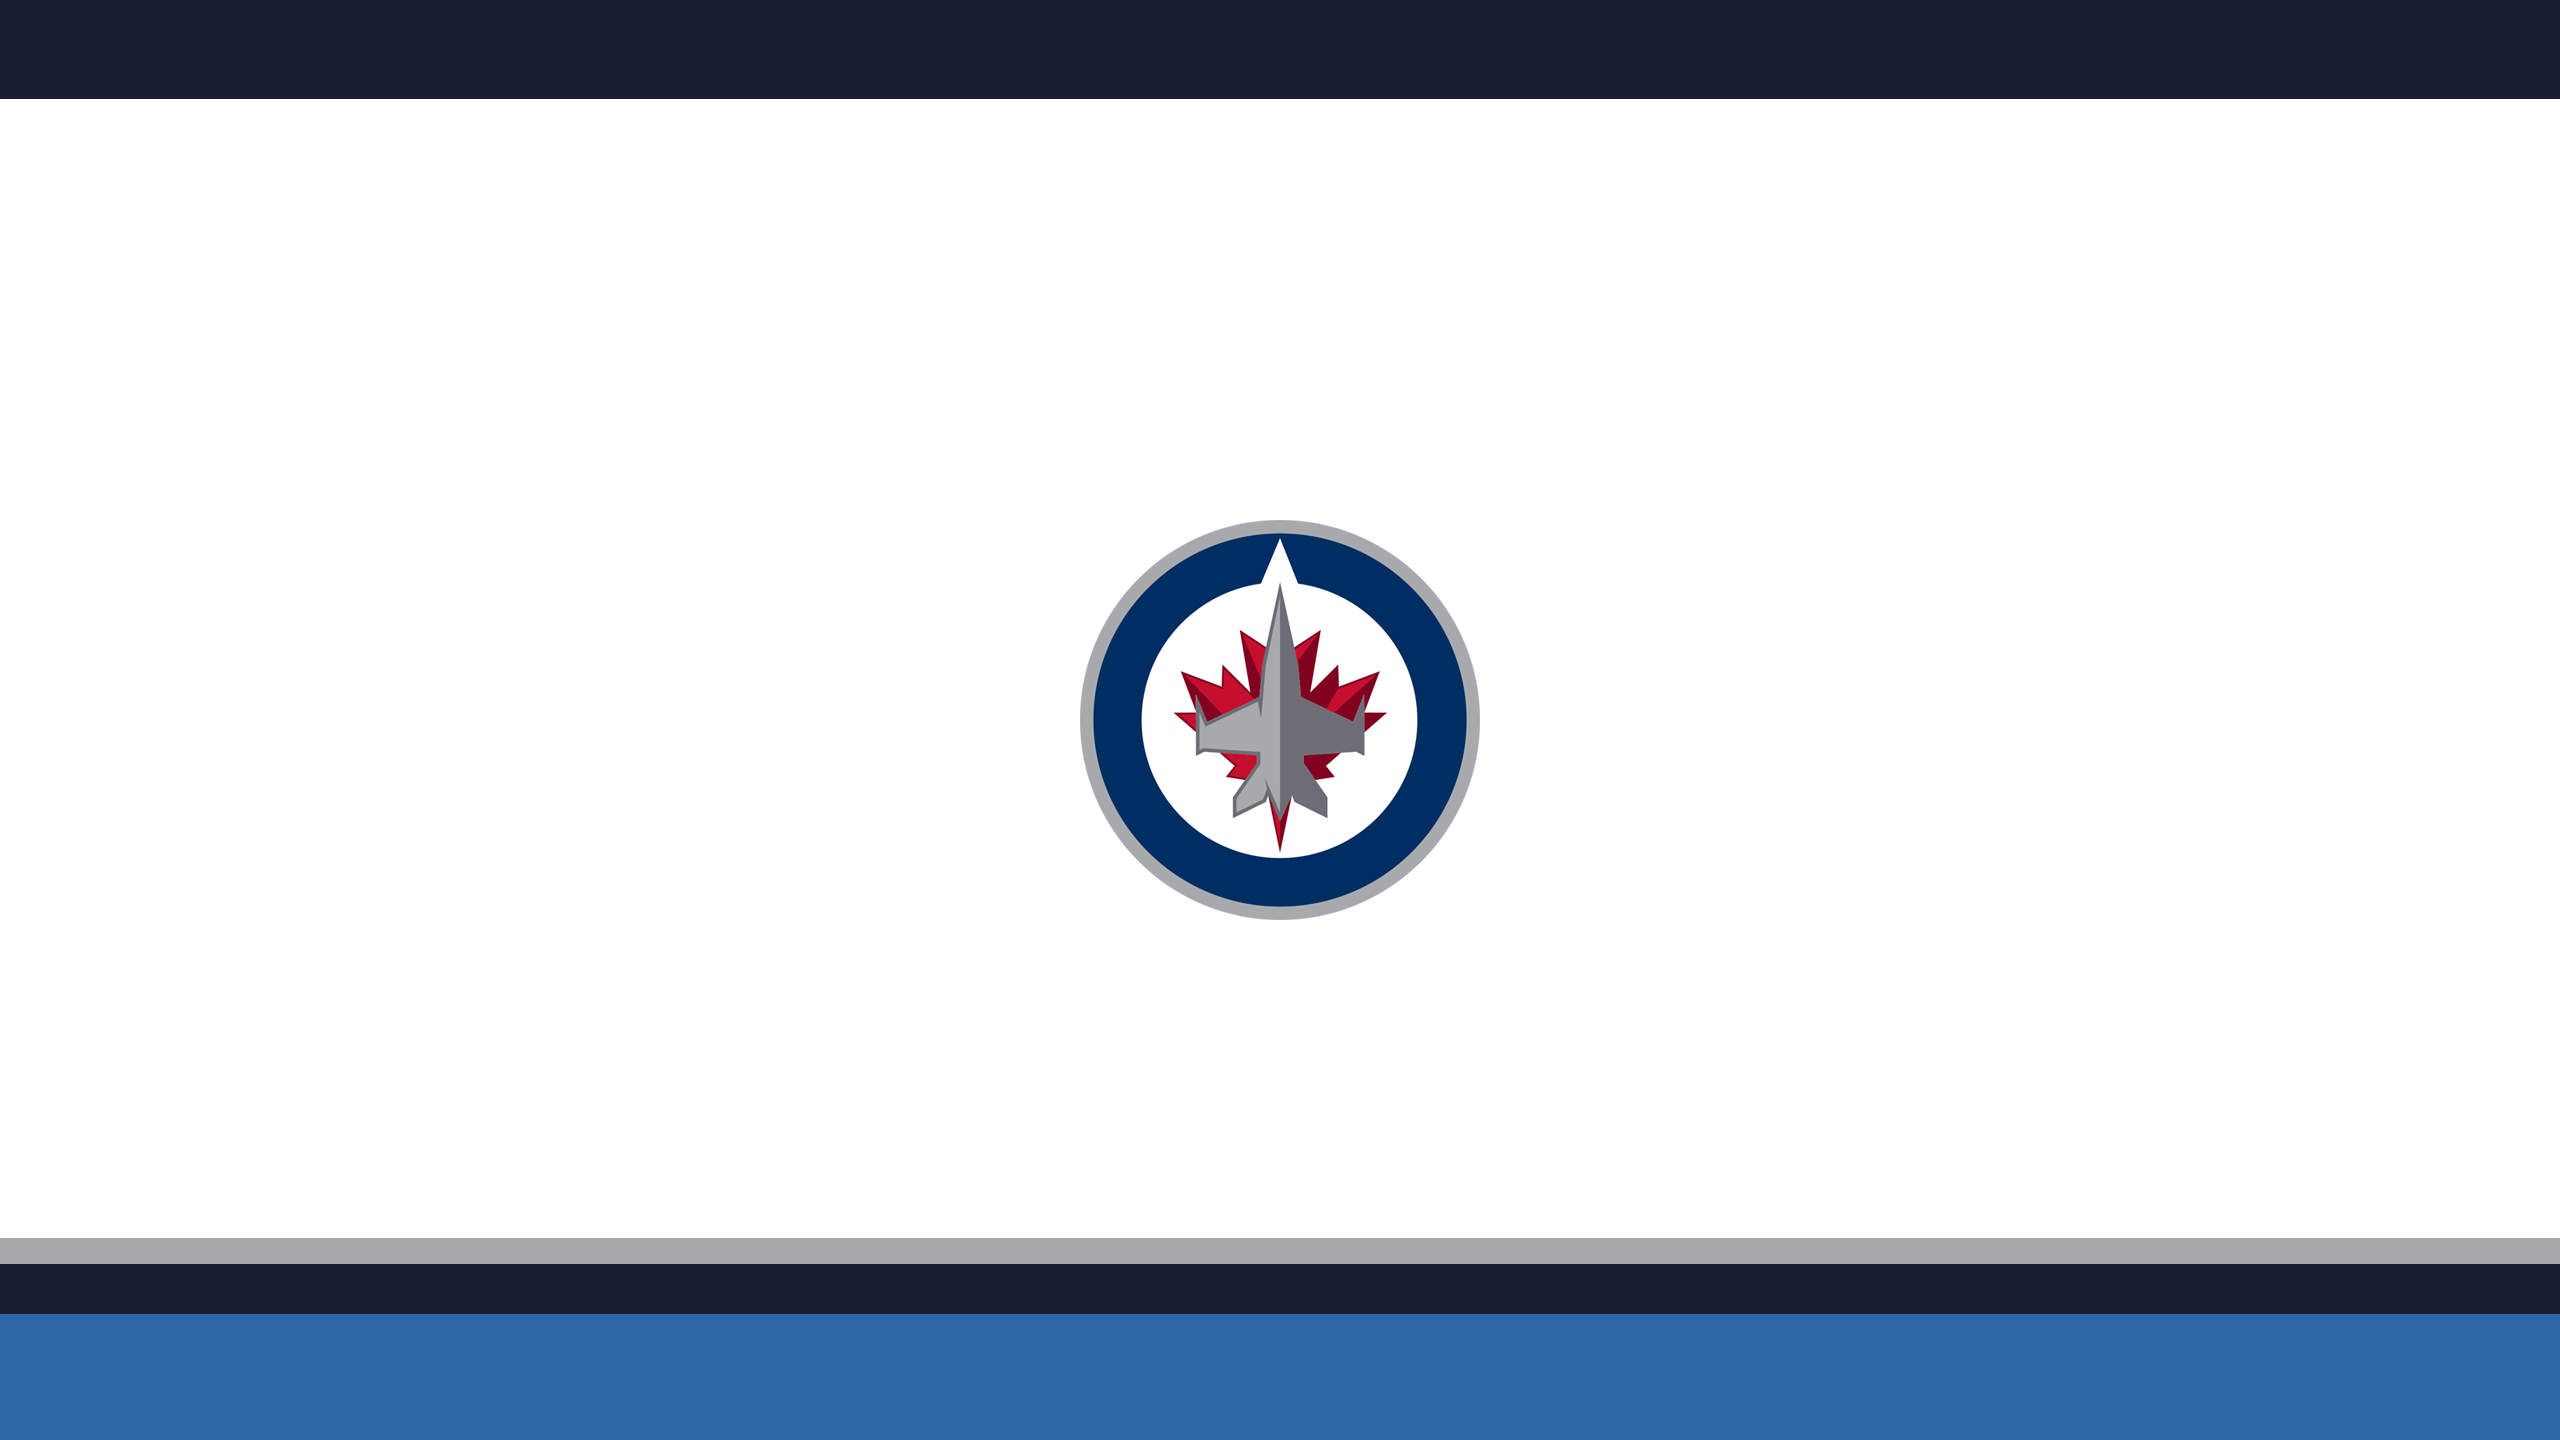 Winnipeg Jets (Away)